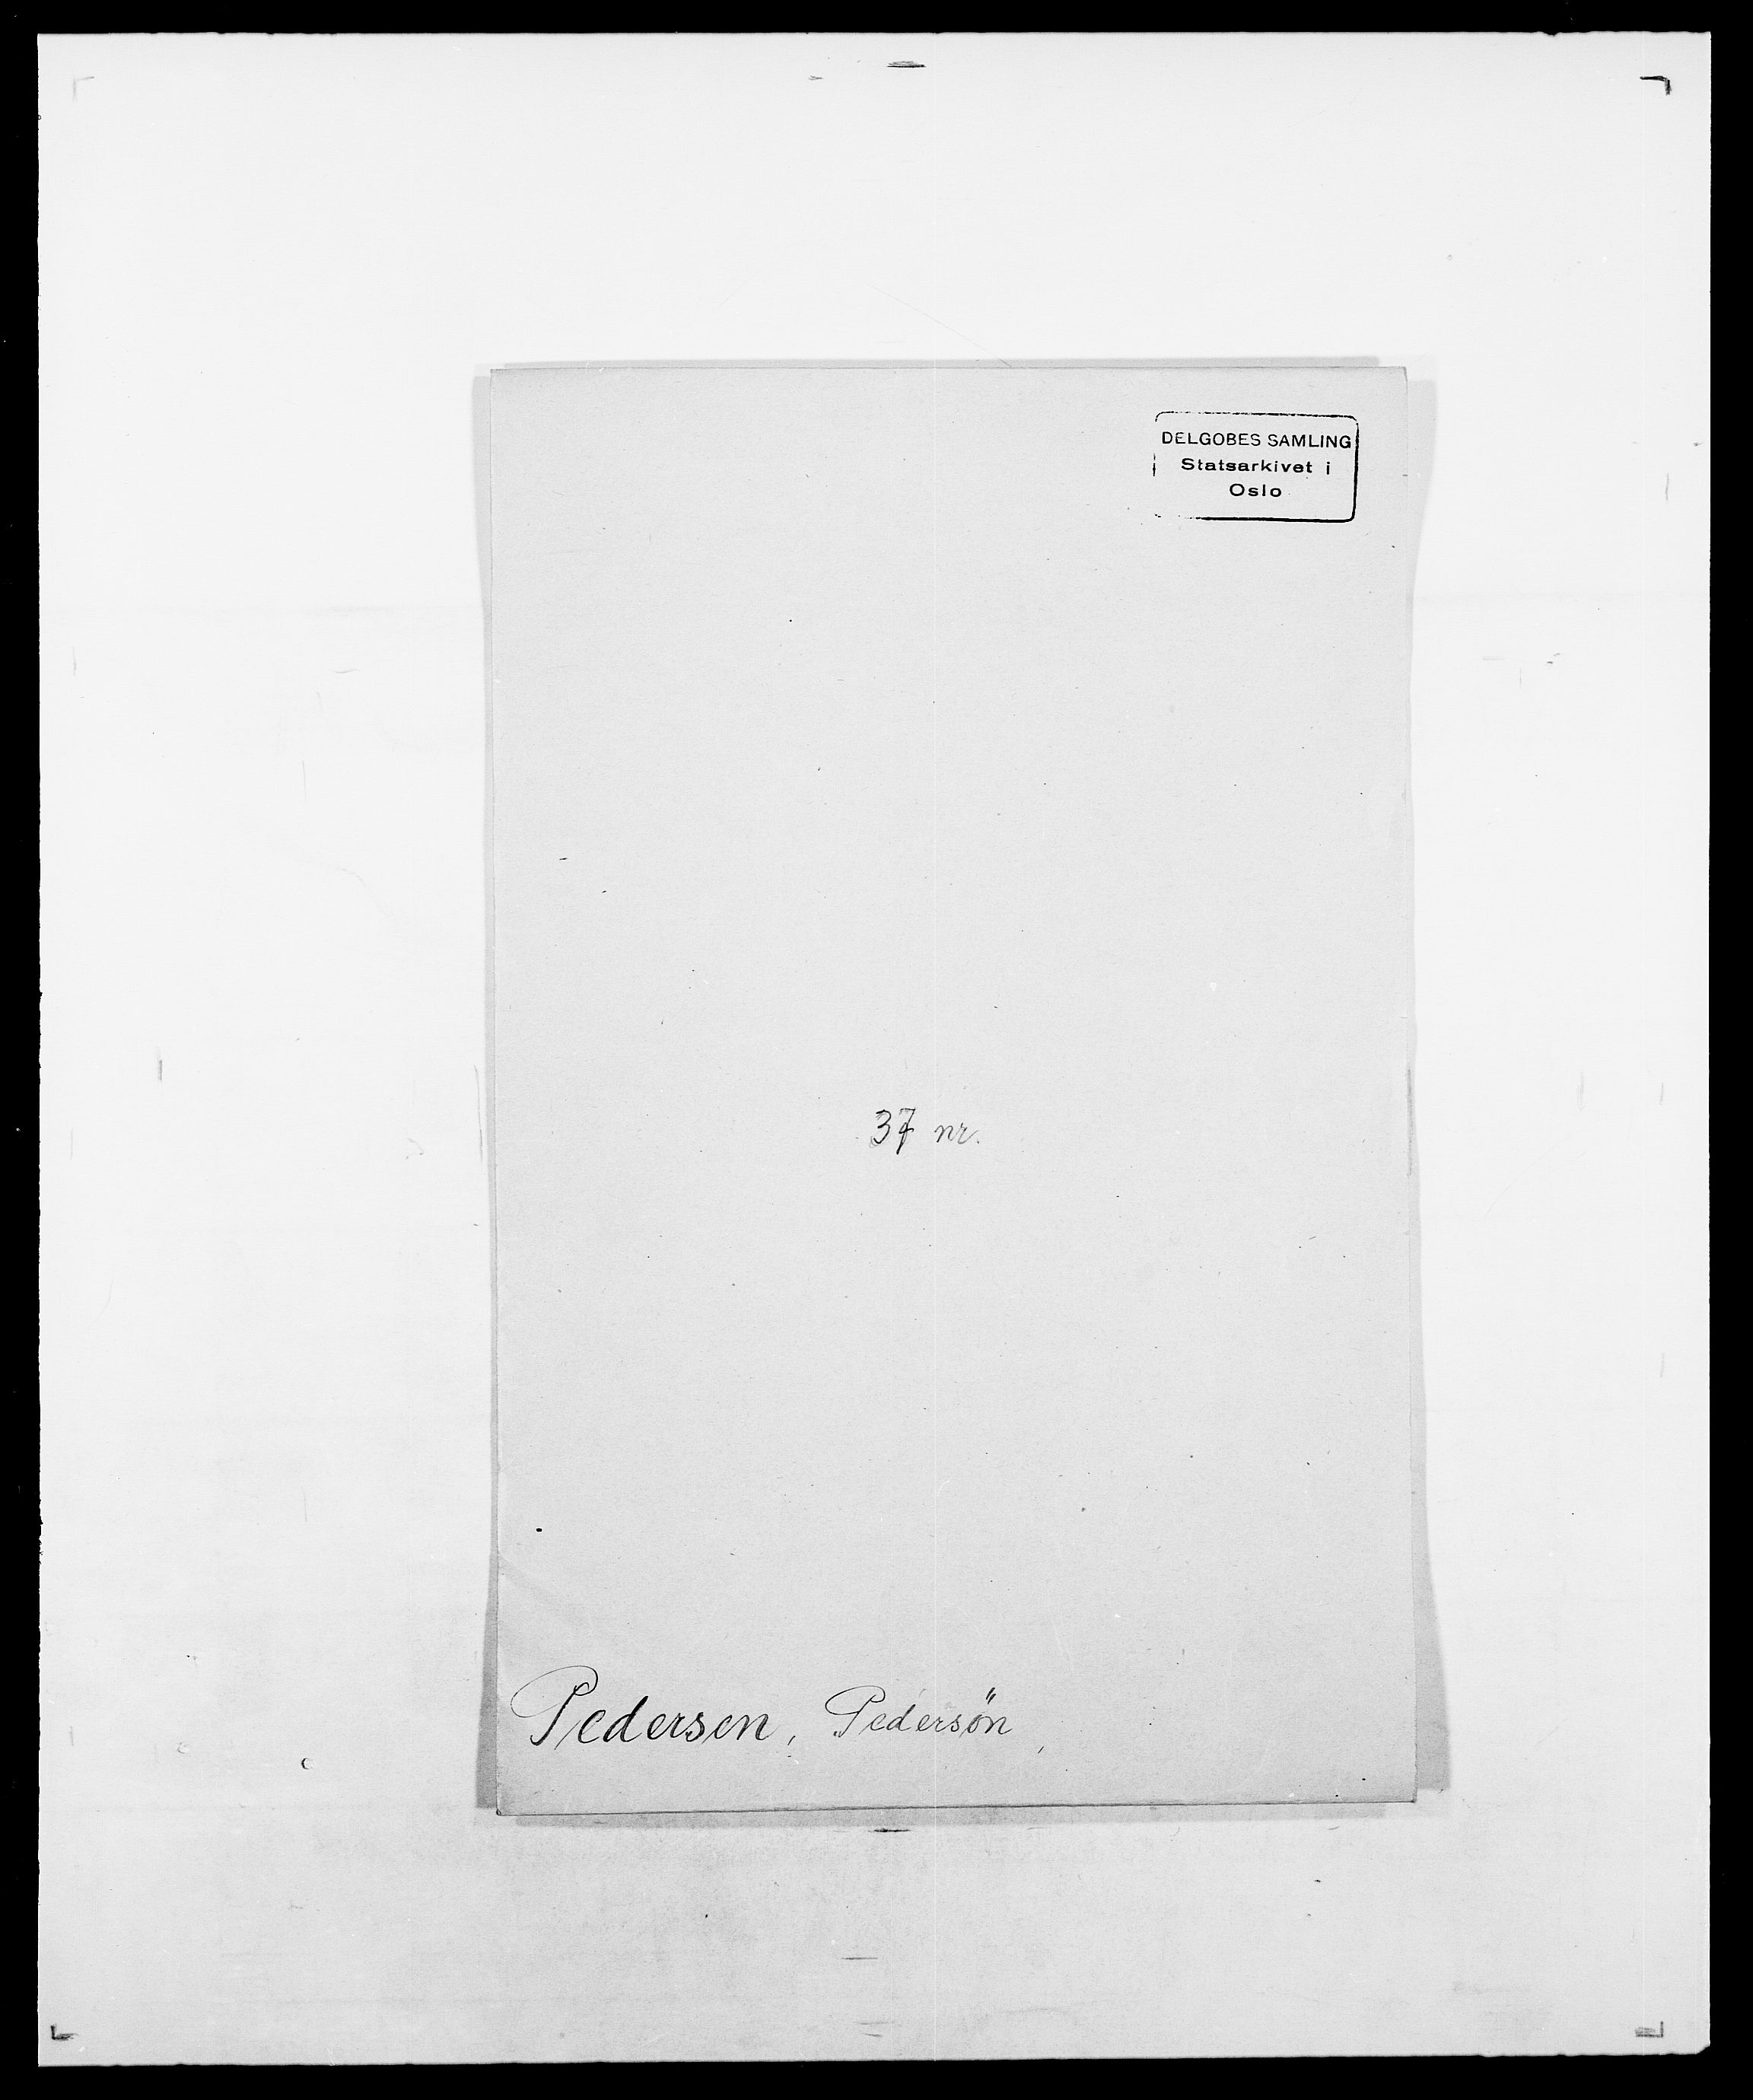 SAO, Delgobe, Charles Antoine - samling, D/Da/L0030: Paars - Pittelkov, s. 271